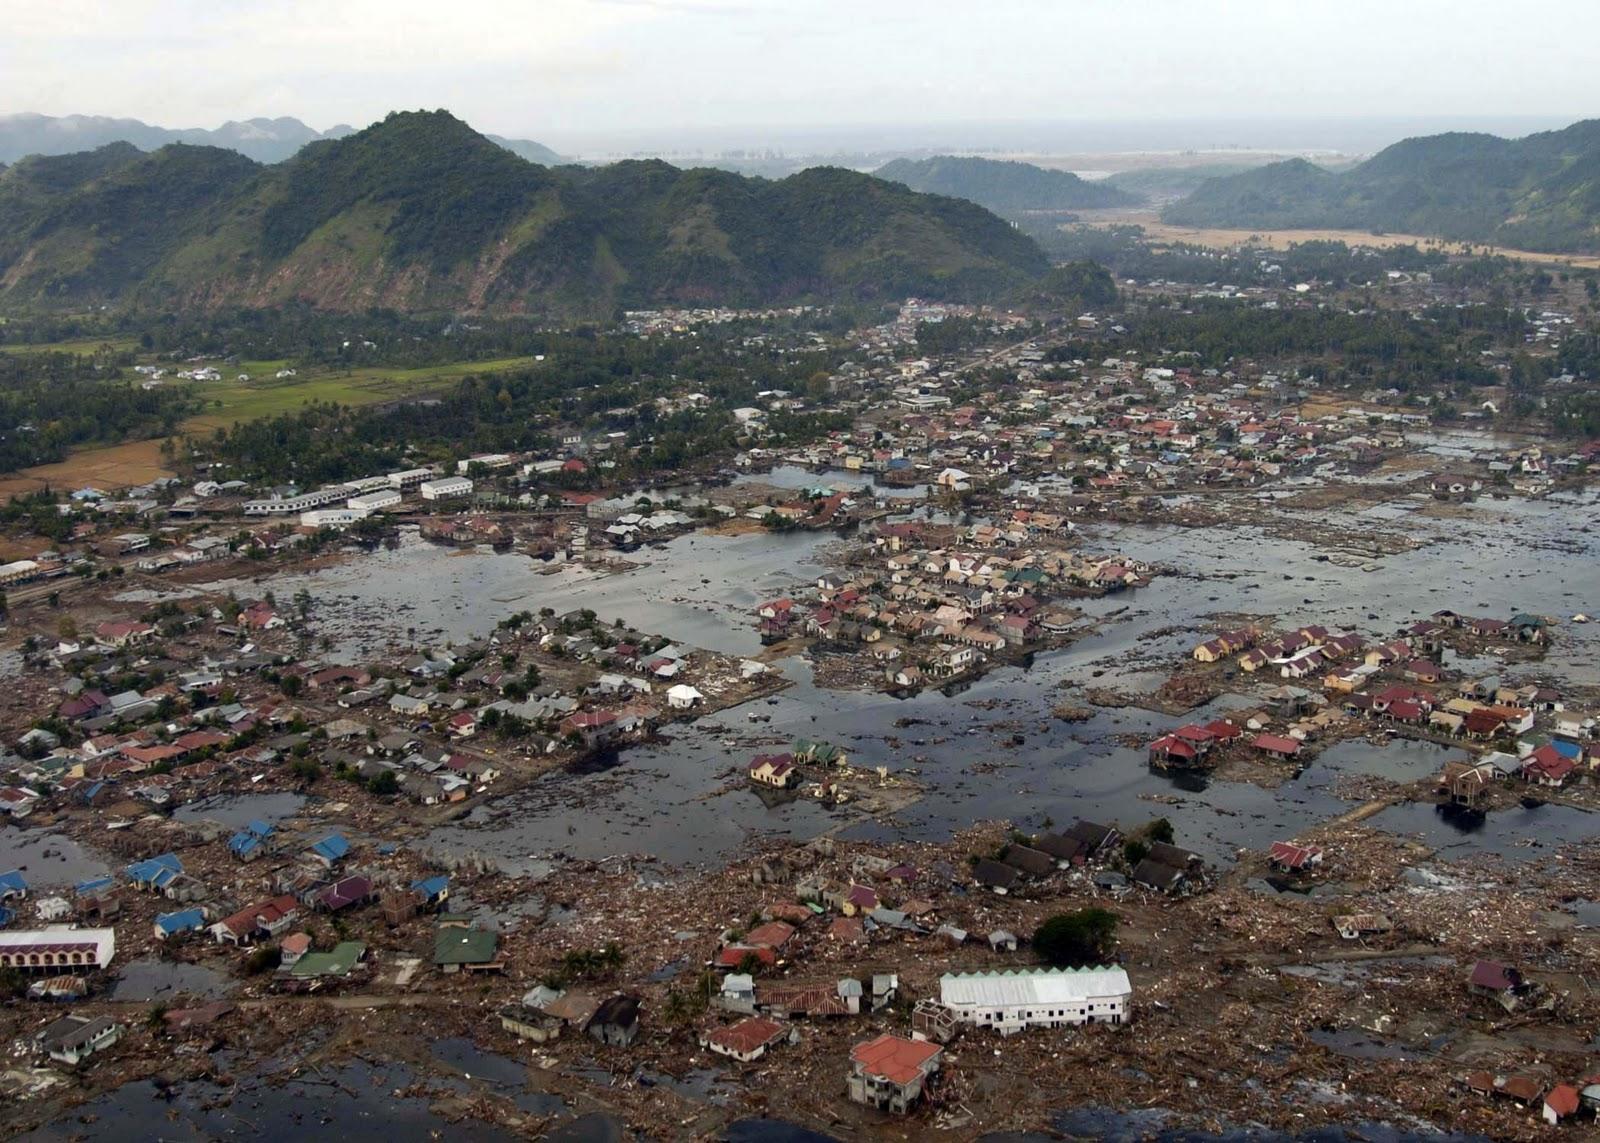 http://2.bp.blogspot.com/_mZO5cRSTS9M/TMrSGJH3RzI/AAAAAAAAAP4/oLo0pi9n7Wk/s1600/US_Navy_050102-N-9593M-040_A_village_near_the_coast_of_Sumatra_lays_in_ruin_after_the_Tsunami_that_struck_South_East_Asia.jpg